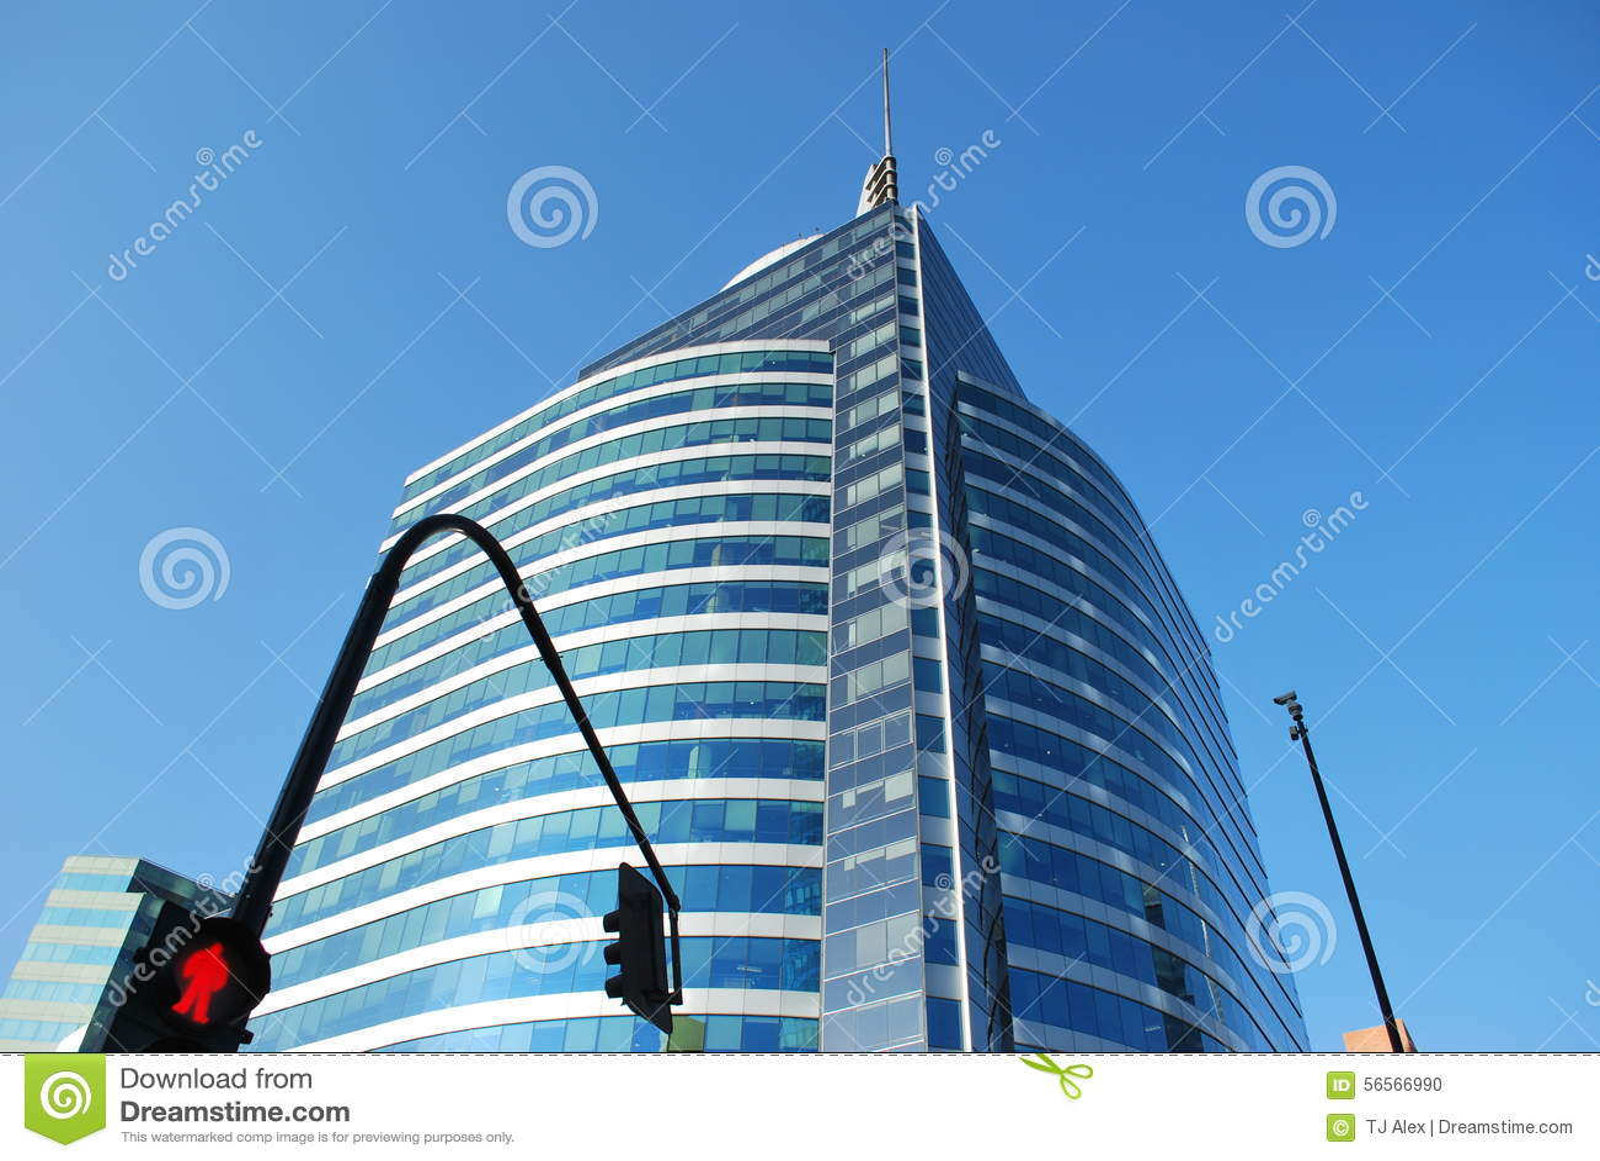 Download Καταπληκτικοί ουρανοξύστες στο Σαντιάγο, Χιλή Στοκ Εικόνες - εικόνα από αυτοκίνητα, χιλή: 56566990